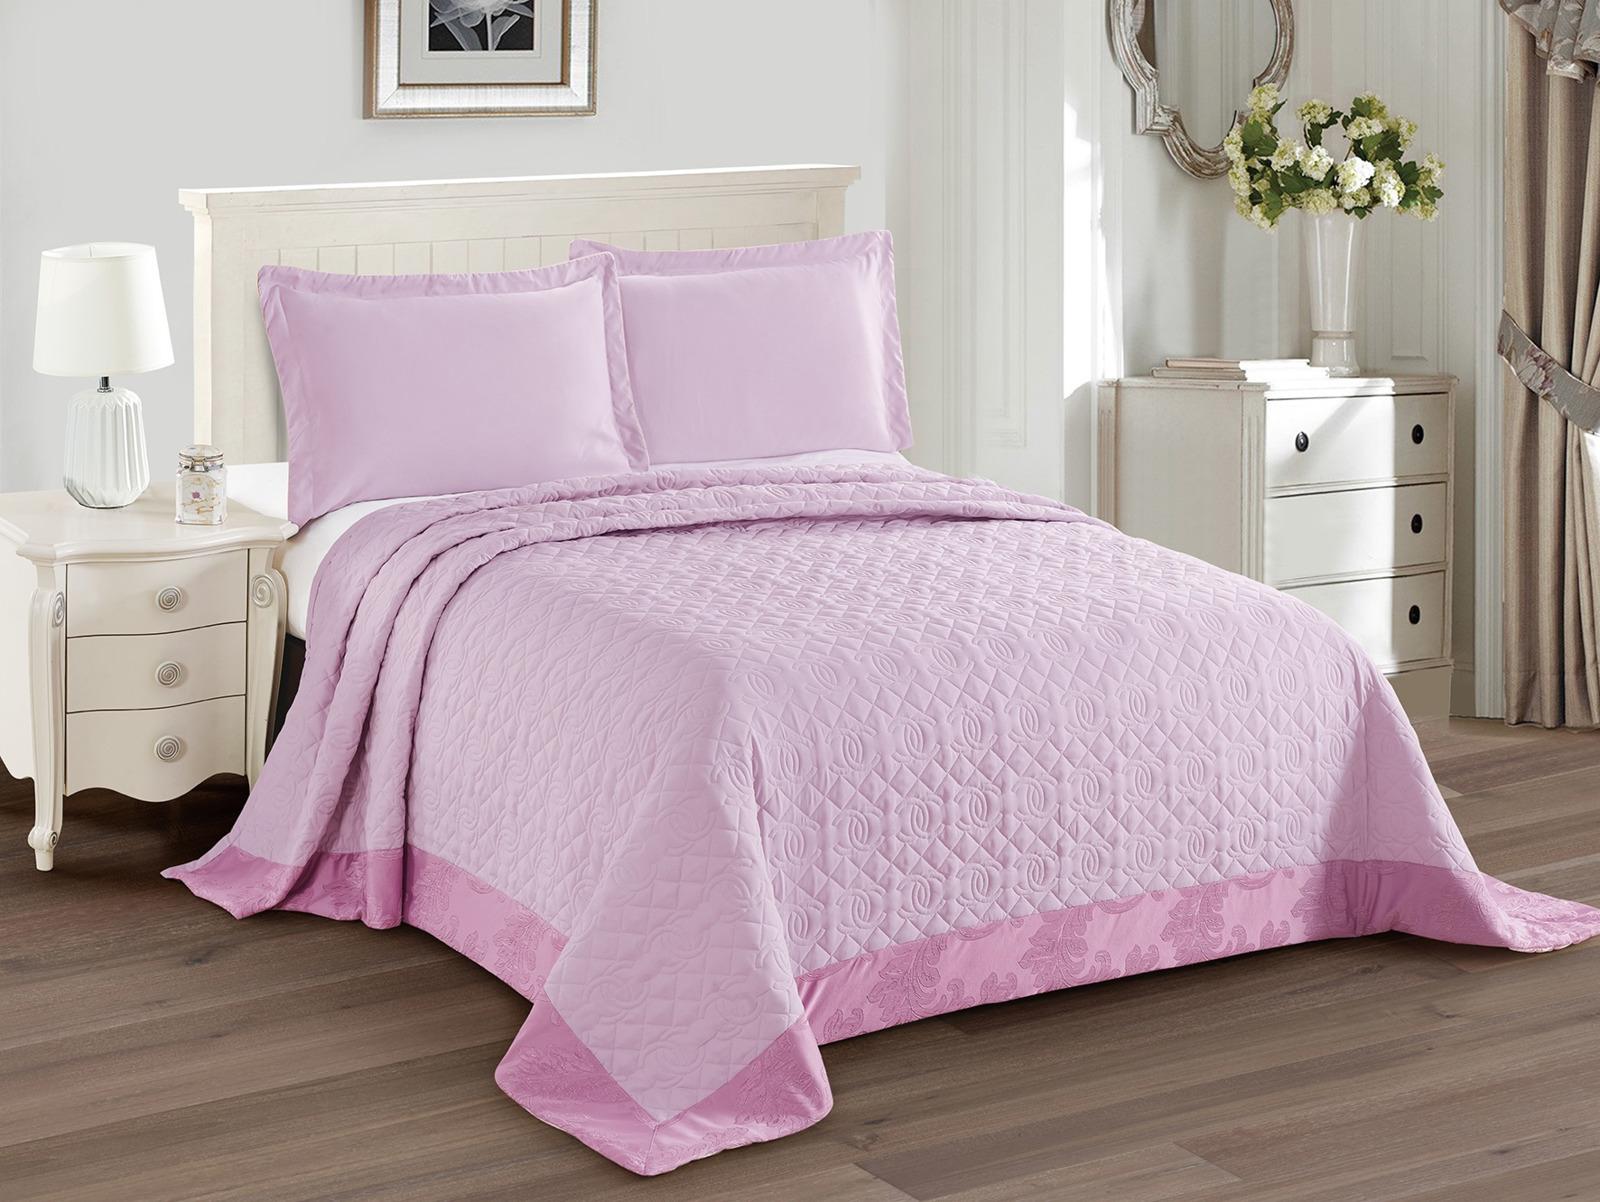 Покрывало с наволочками Cleo Monifico, 240/017-CH, розовый, 240х260, наволочки 50х70, 2 шт цена